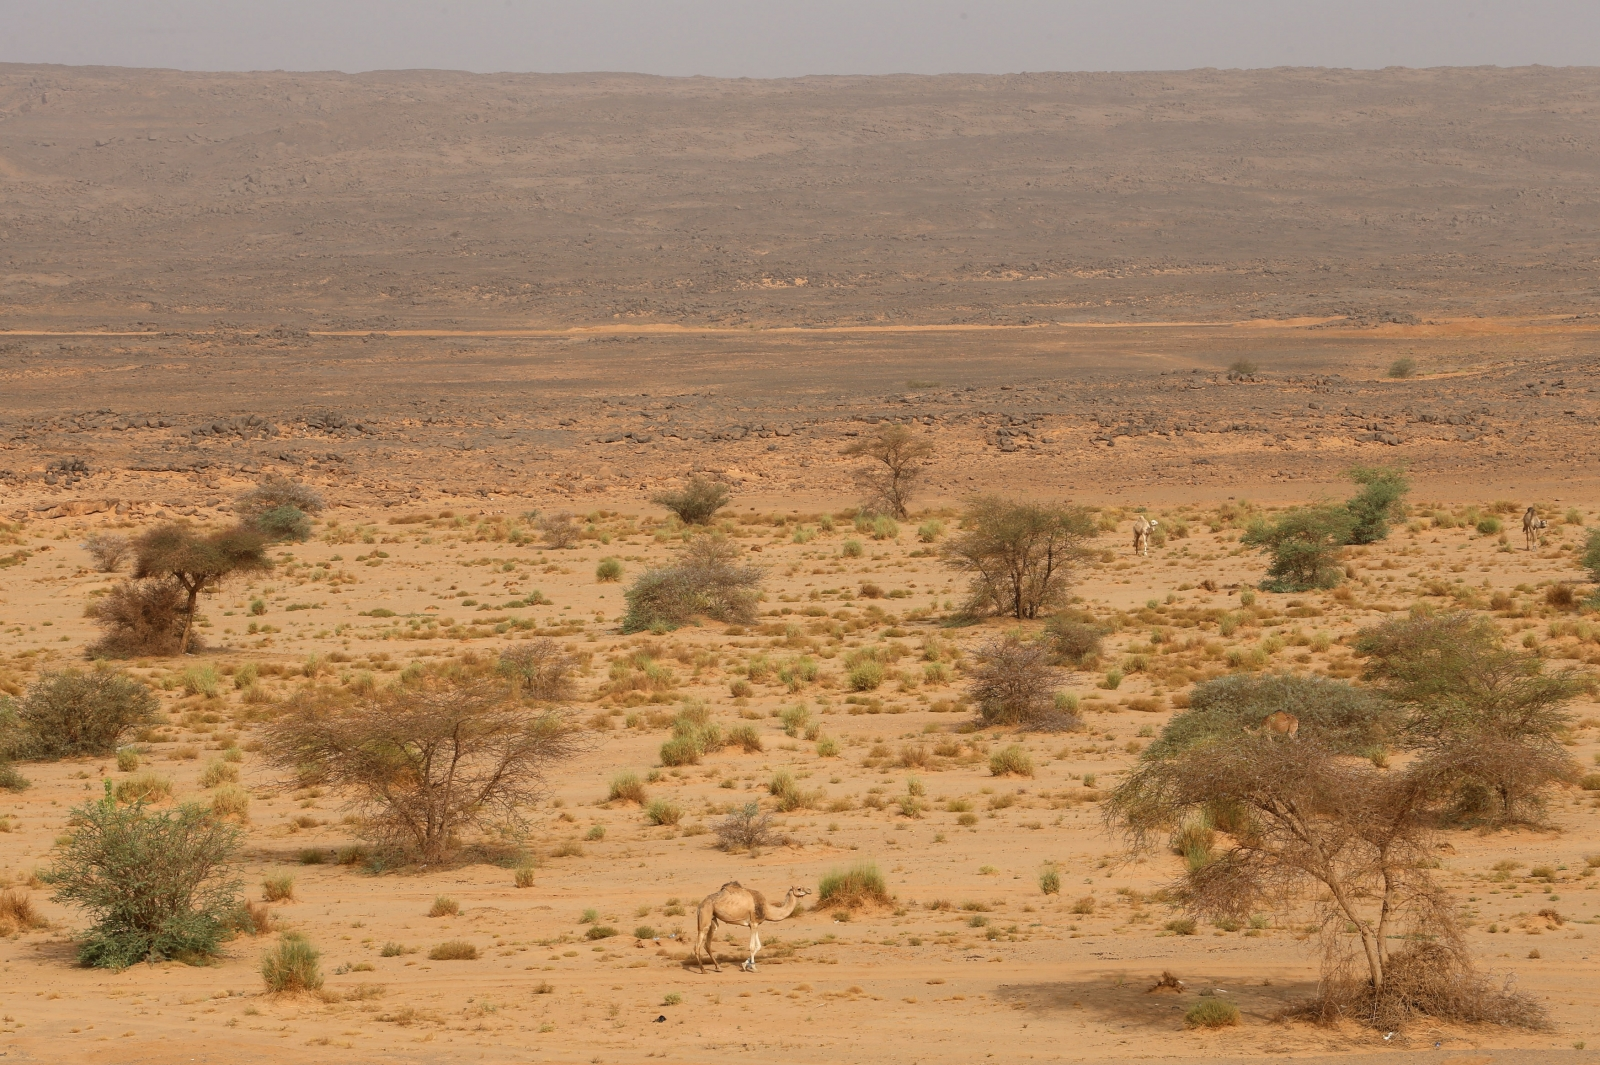 Niger migrants found dead in desert